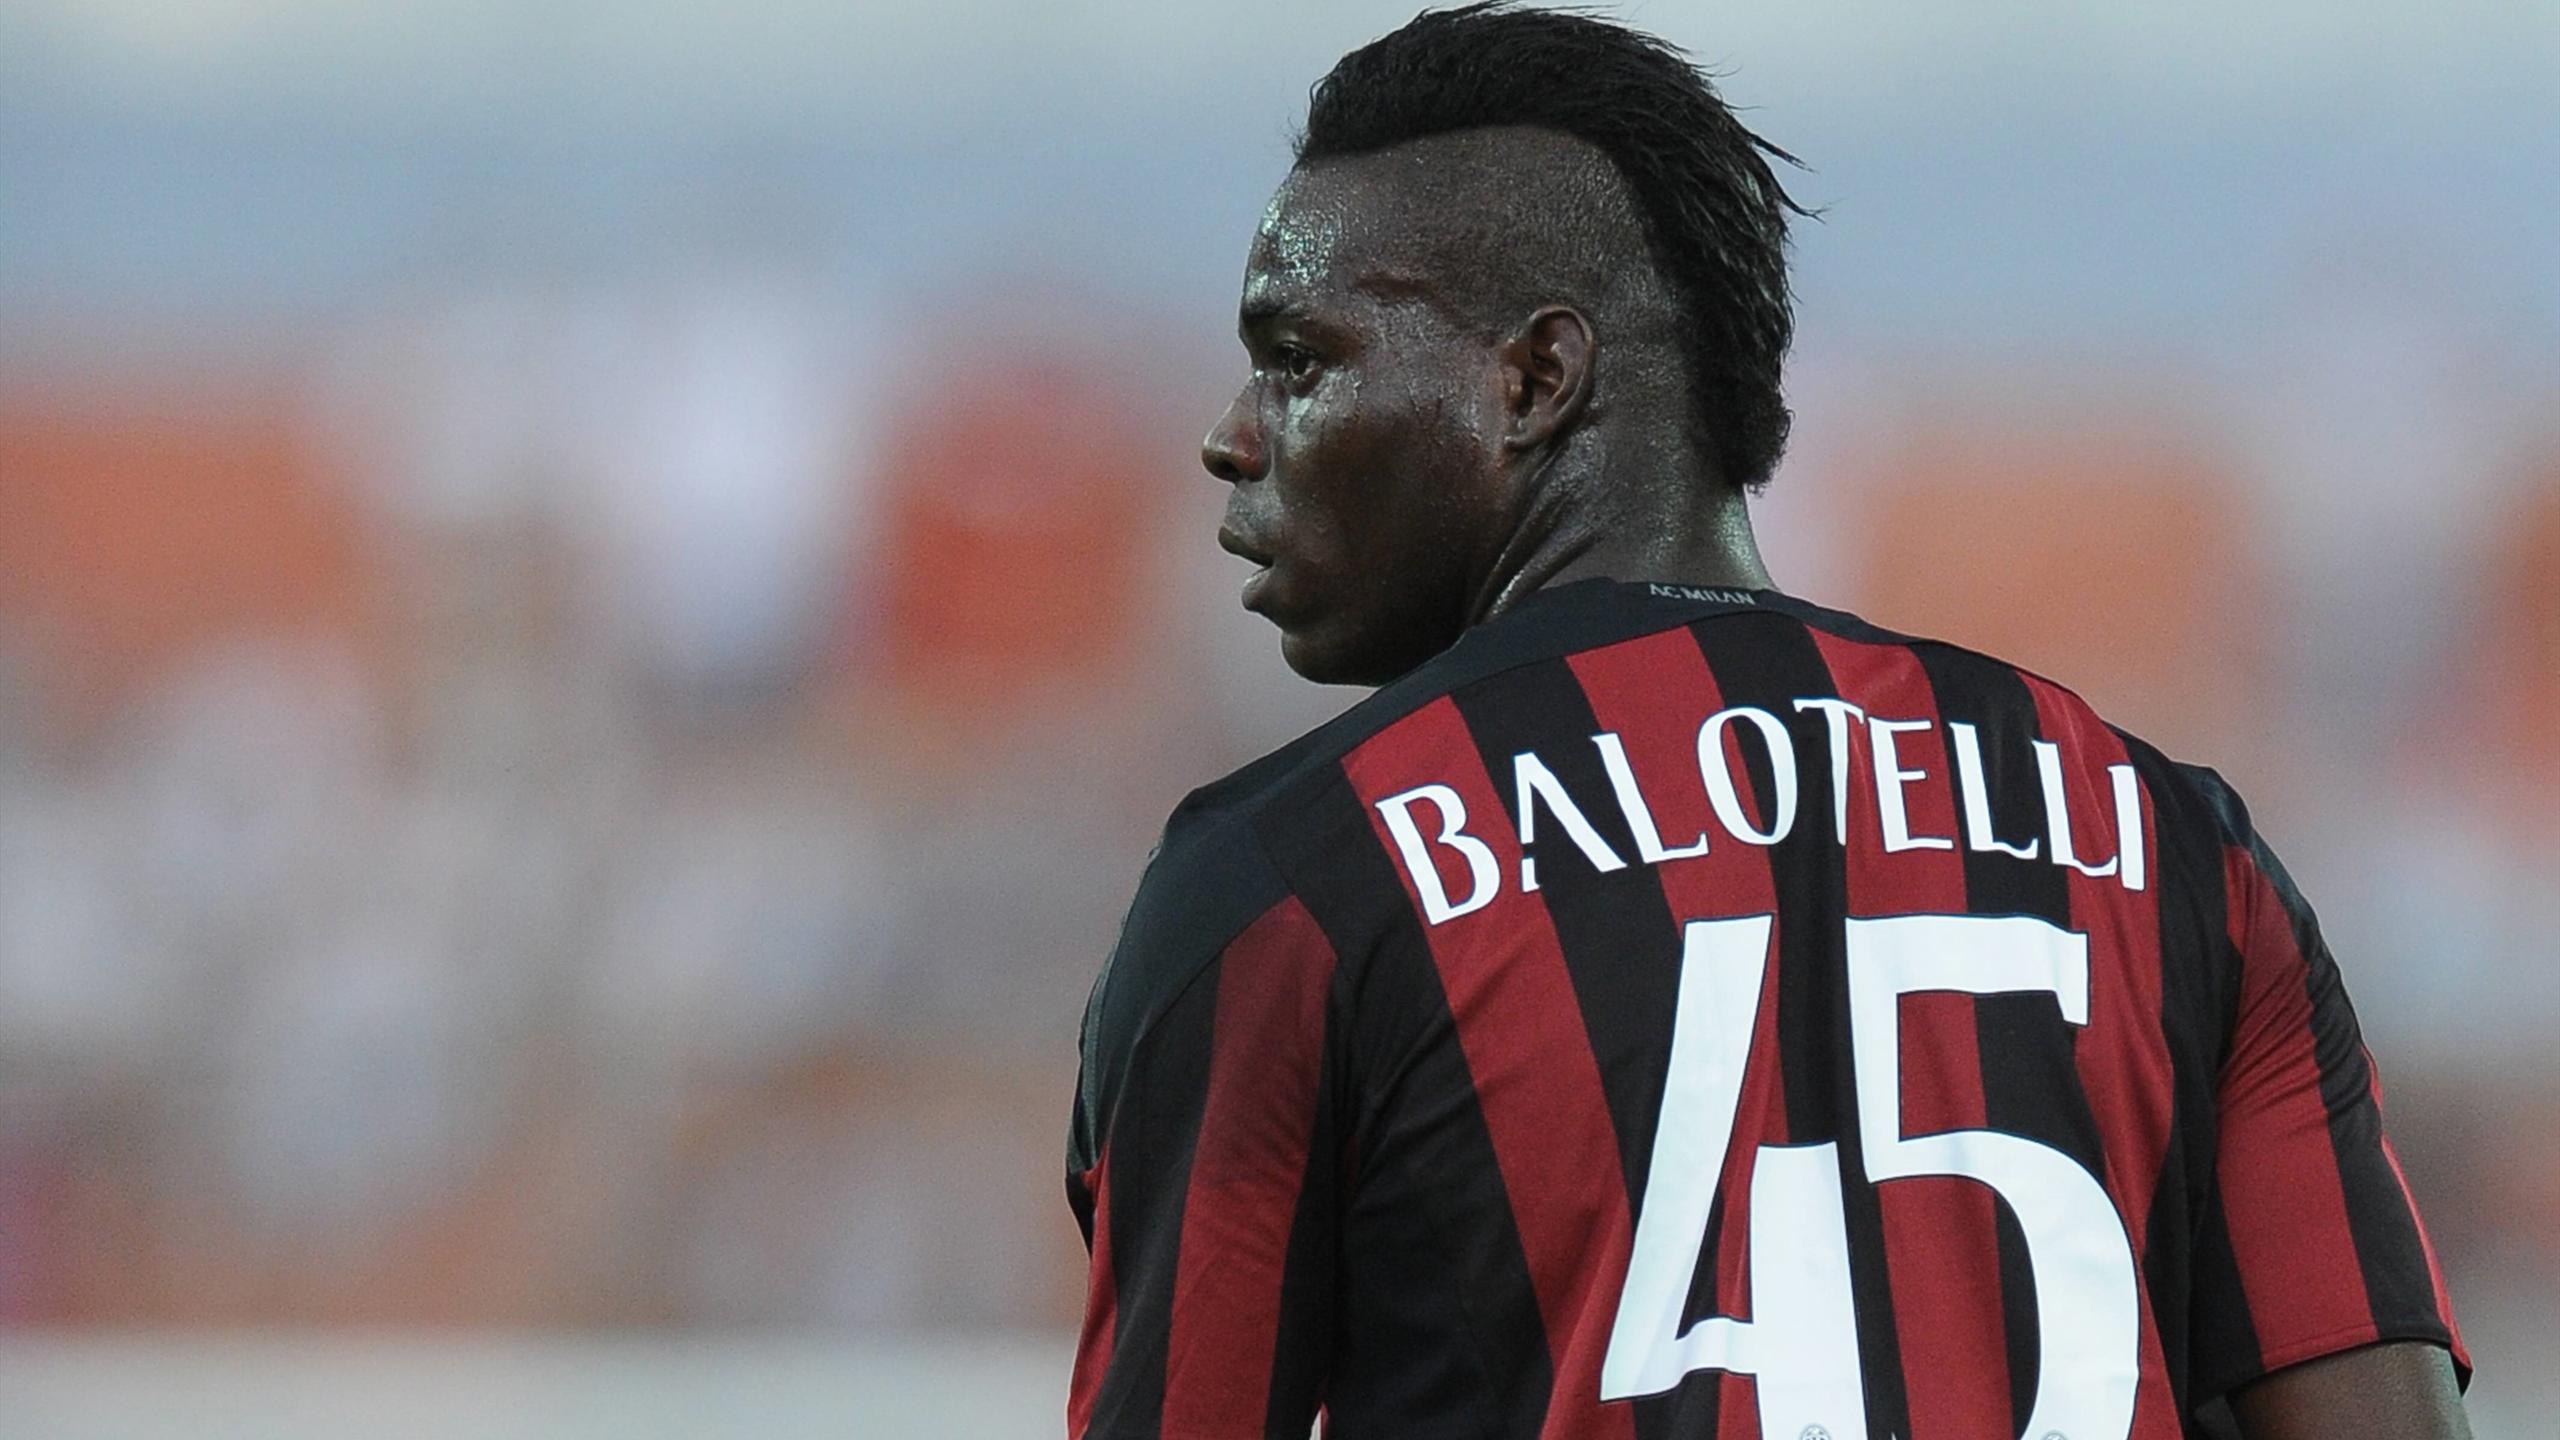 Mario Balotelli of AC Milan